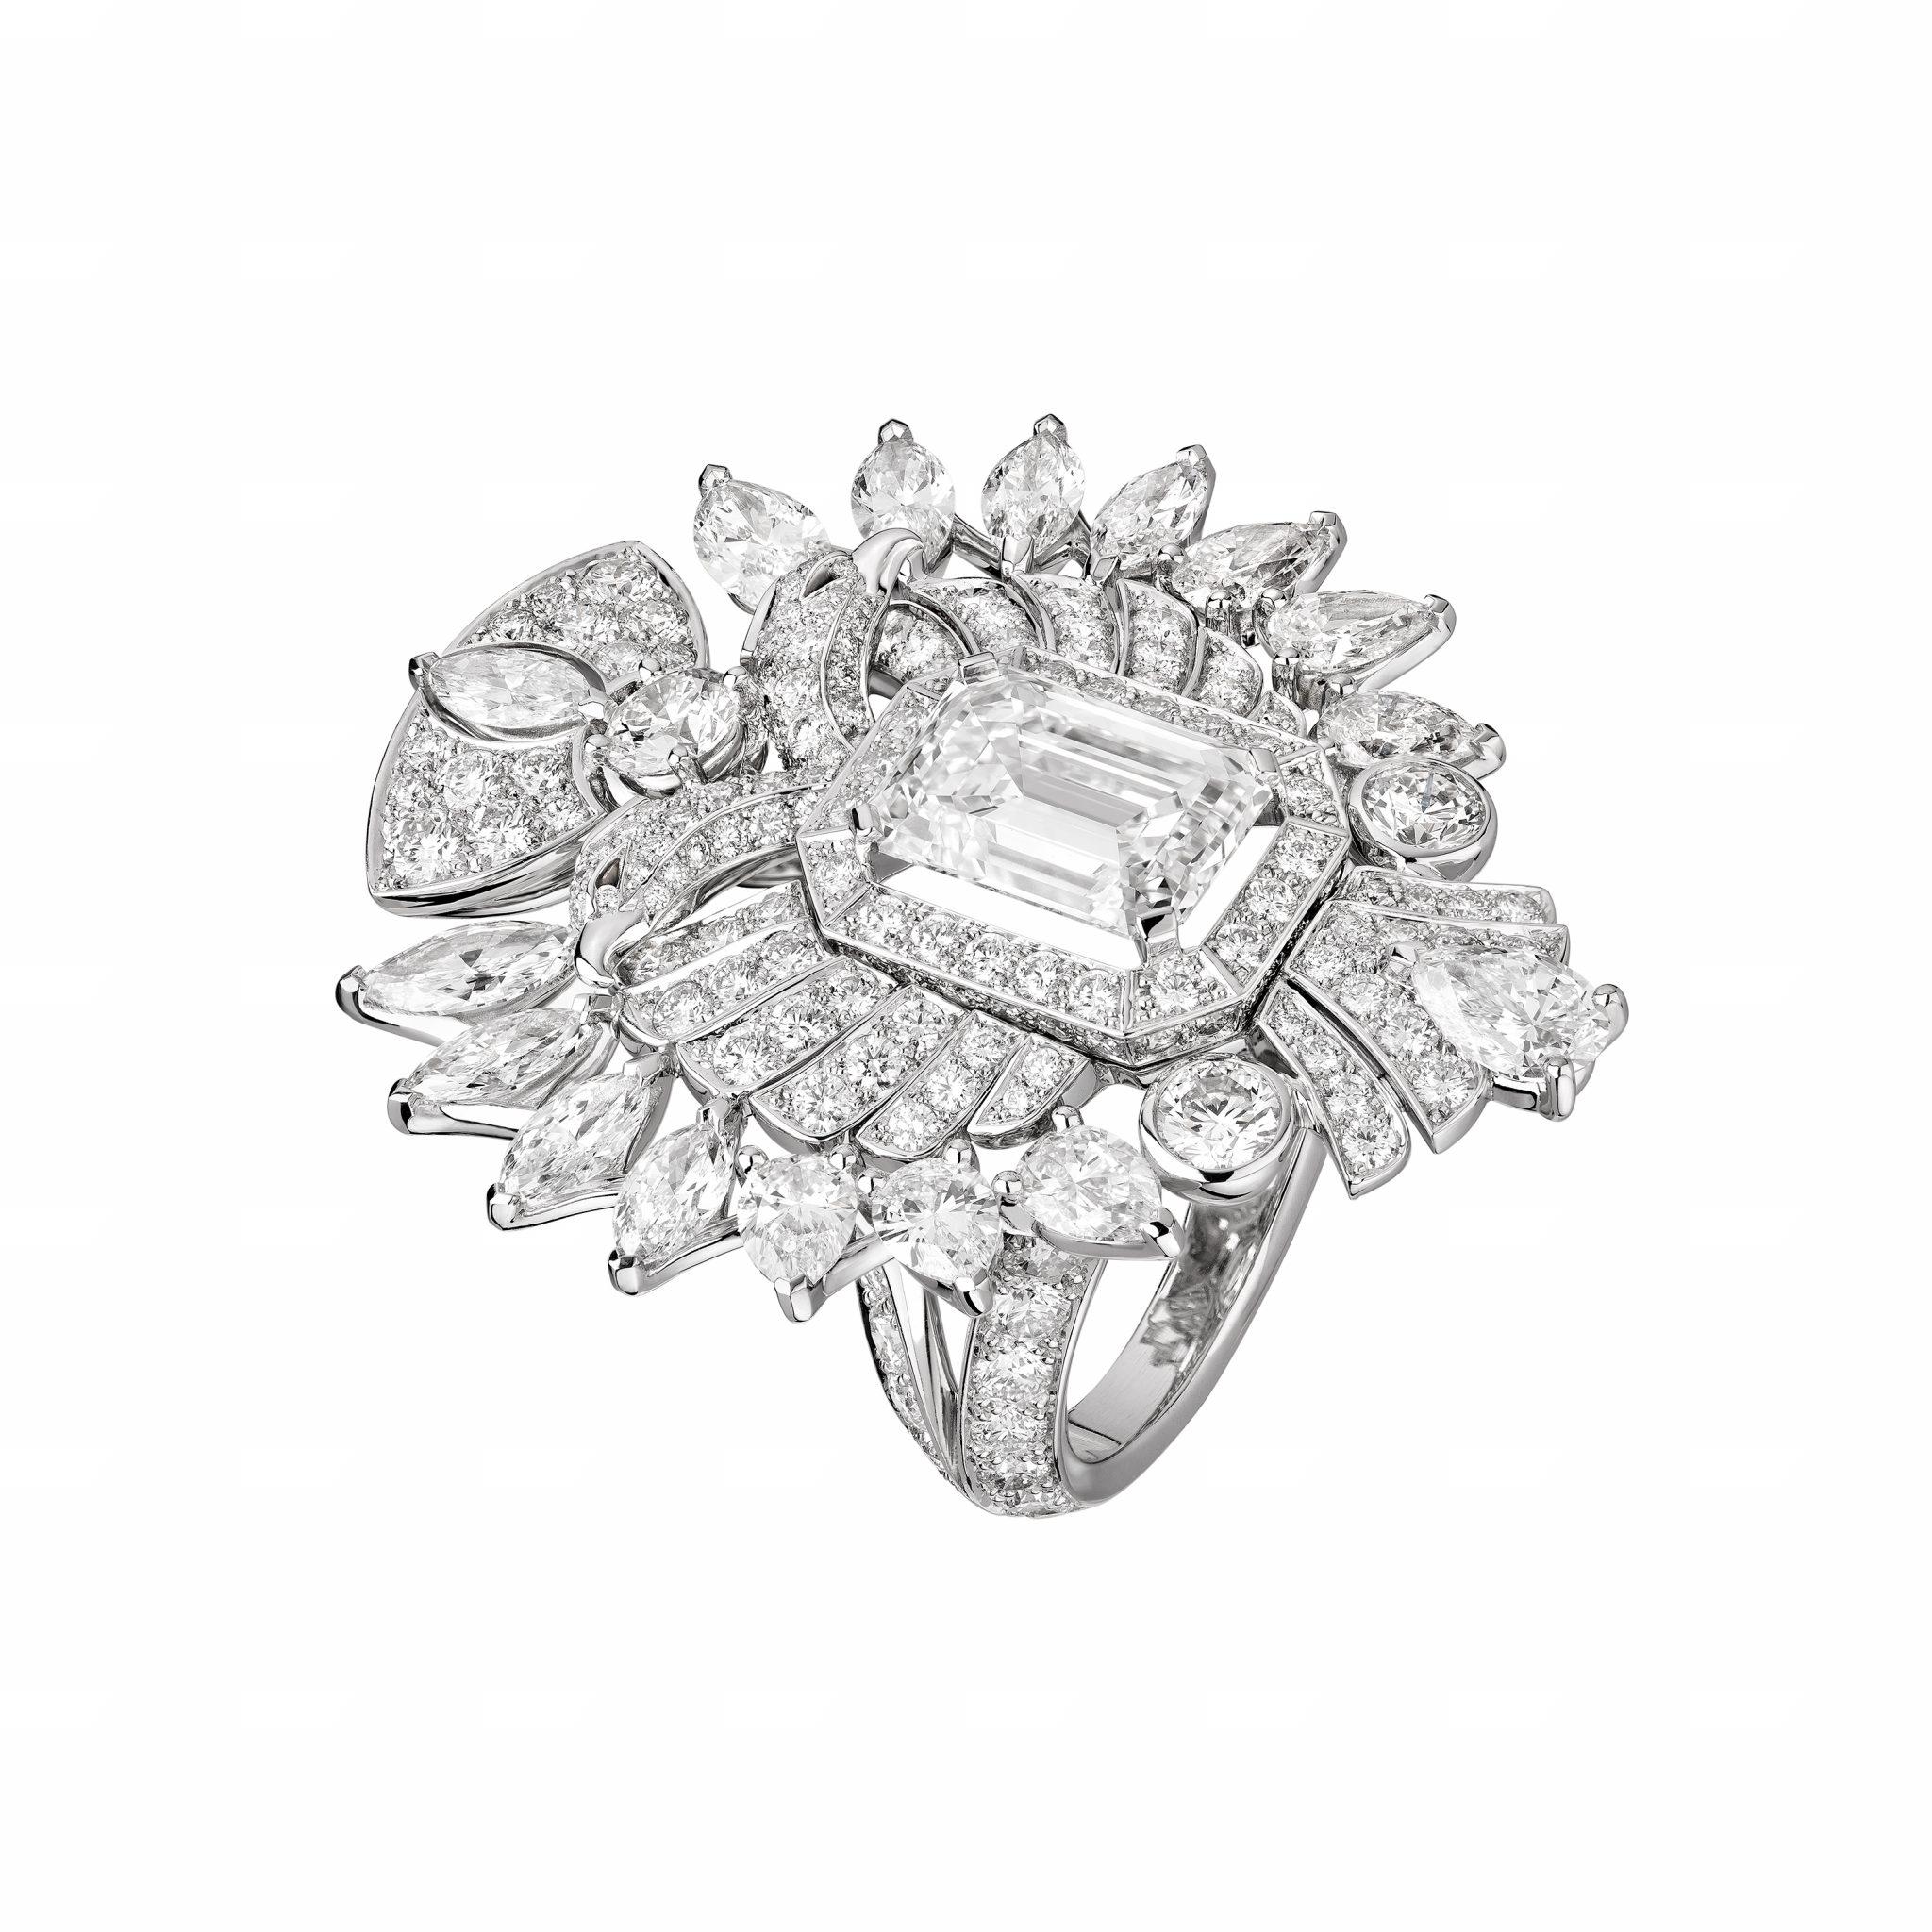 Aigle Cambon ring CHANEL Esprit de Gabrielle espritdegabrielle.com